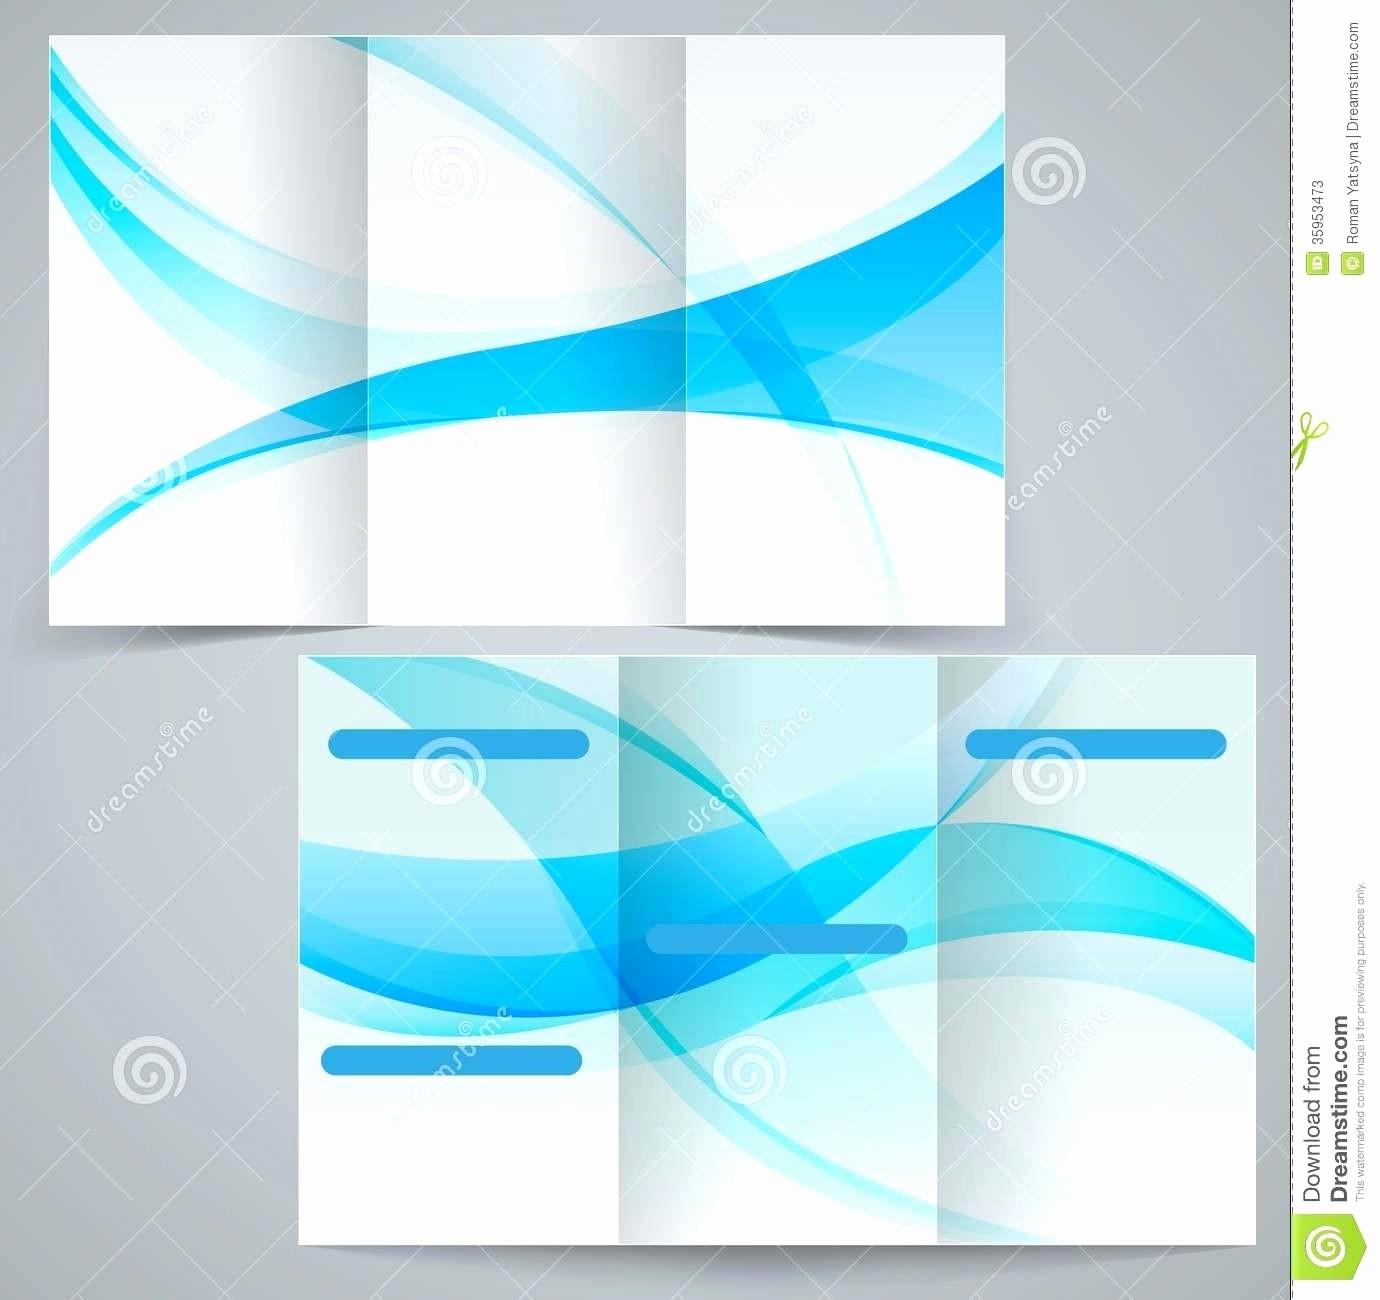 Microsoft Word Tri Fold Template Inspirational Template Brochure Template for Microsoft Word